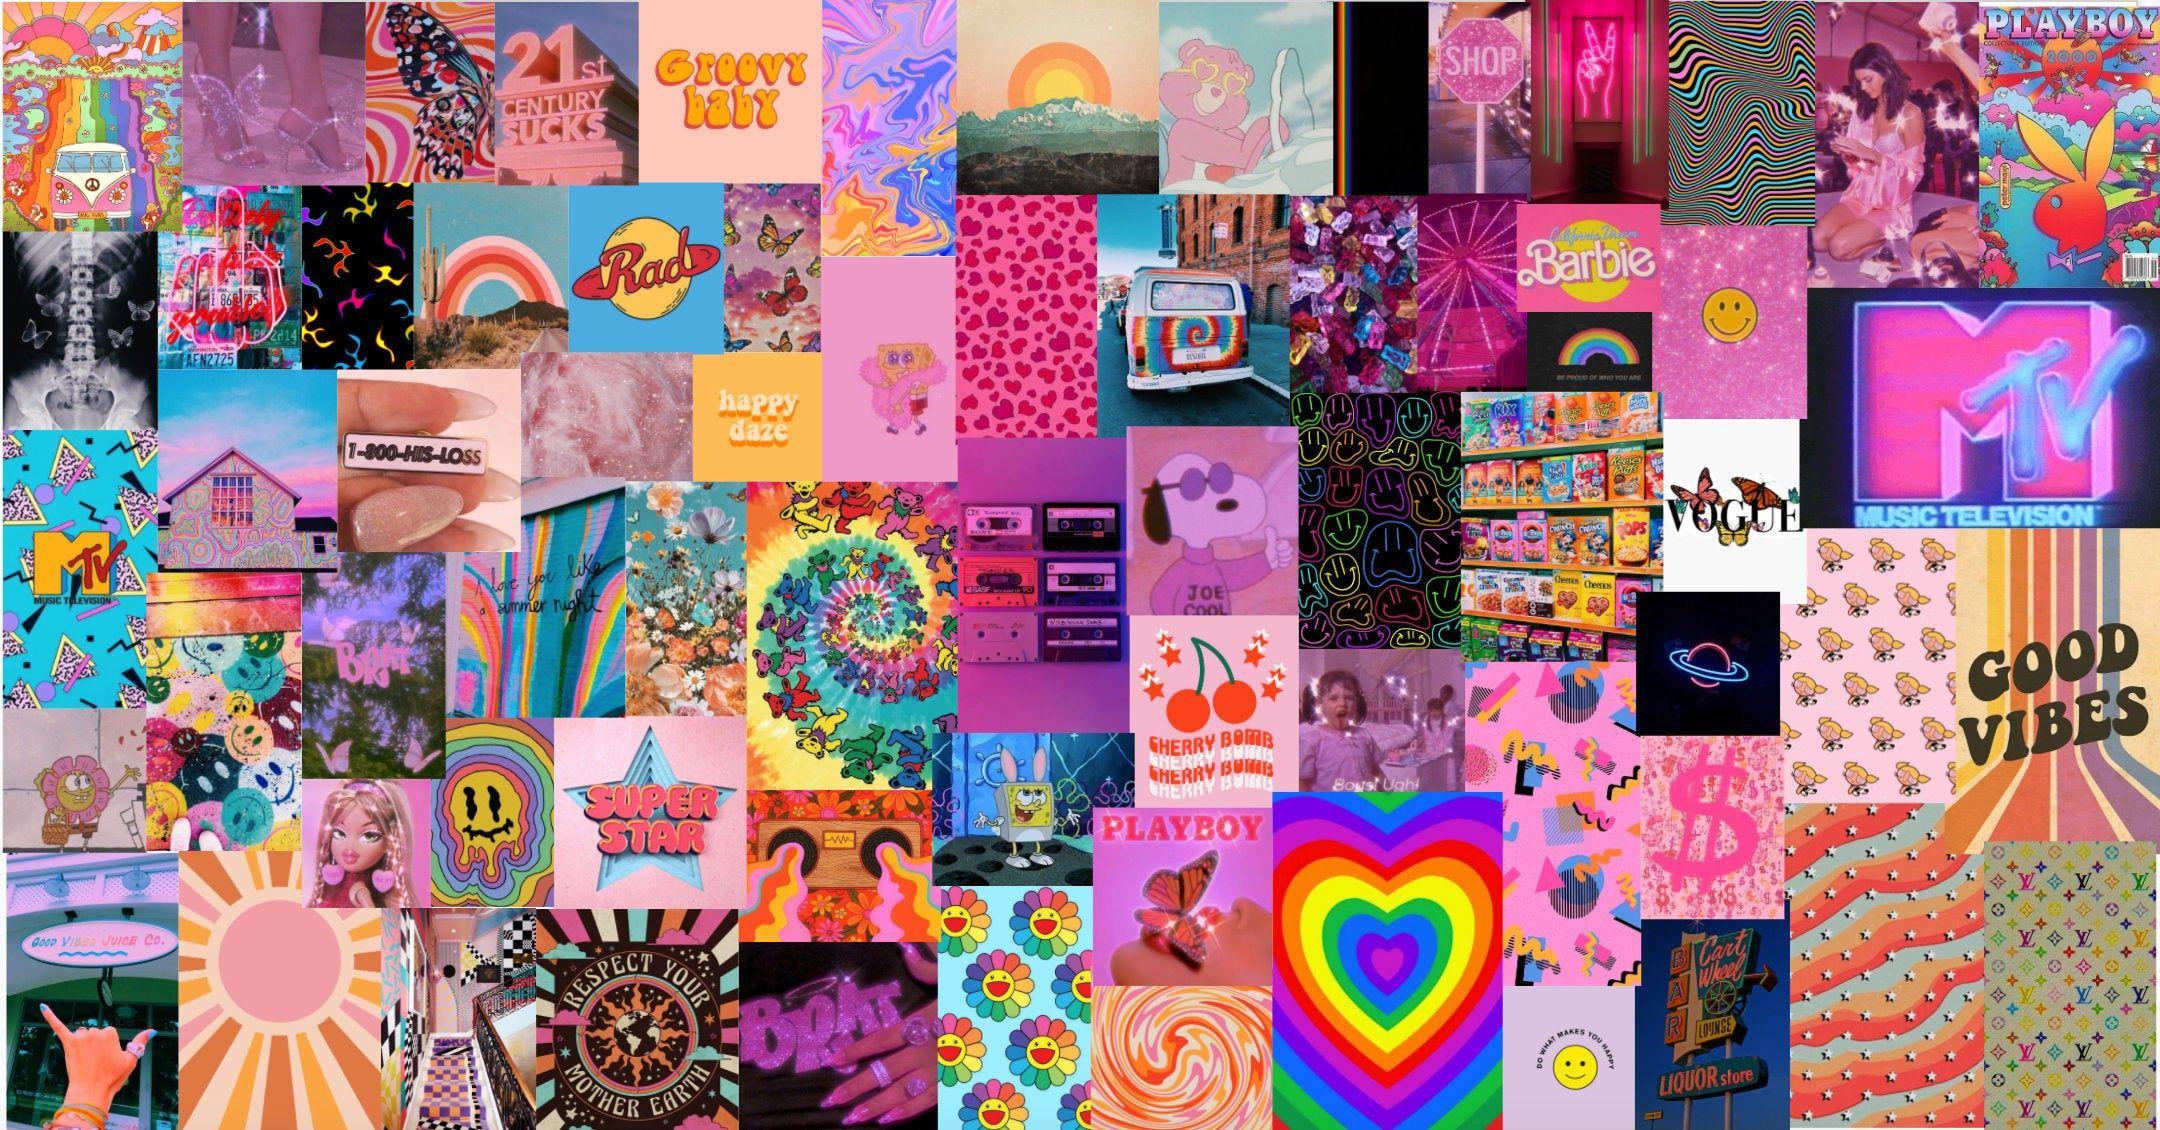 Retro Rainbow Vibes Aesthetic Wall Collage Kit - Digital Download - 70pcs